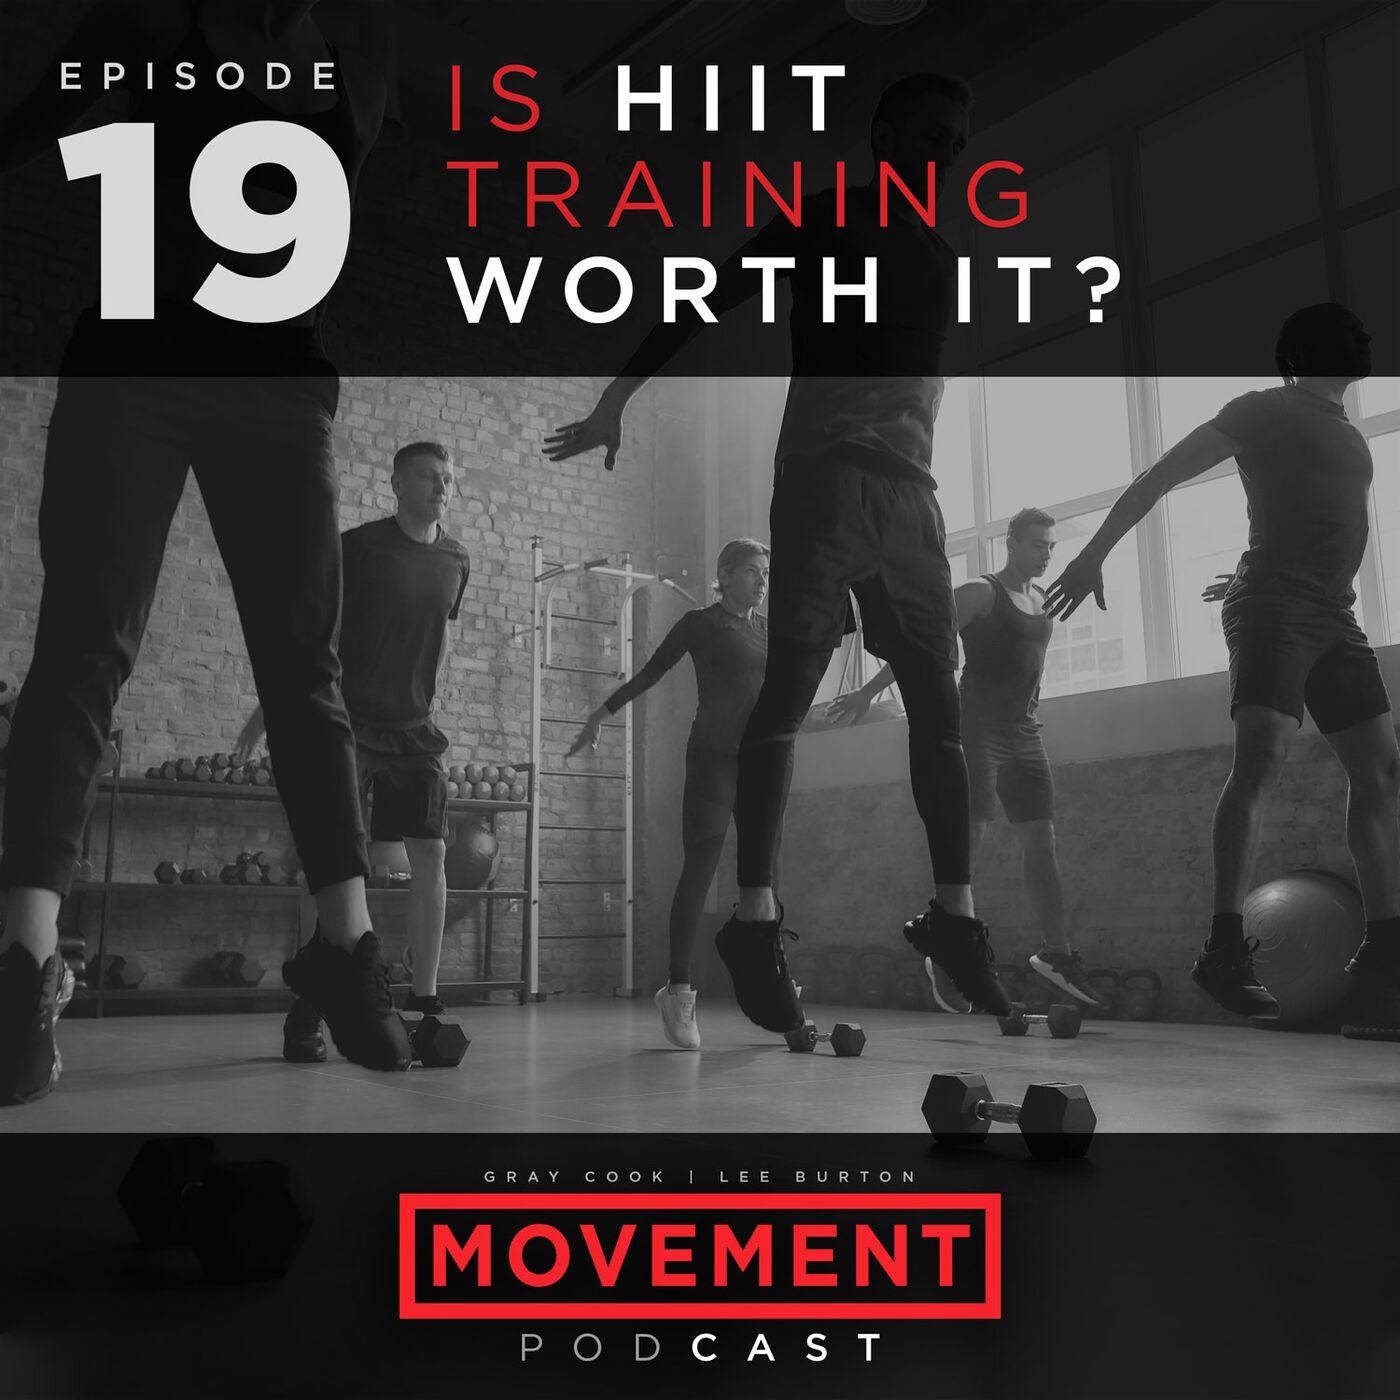 Is HIIT Training Worth It?